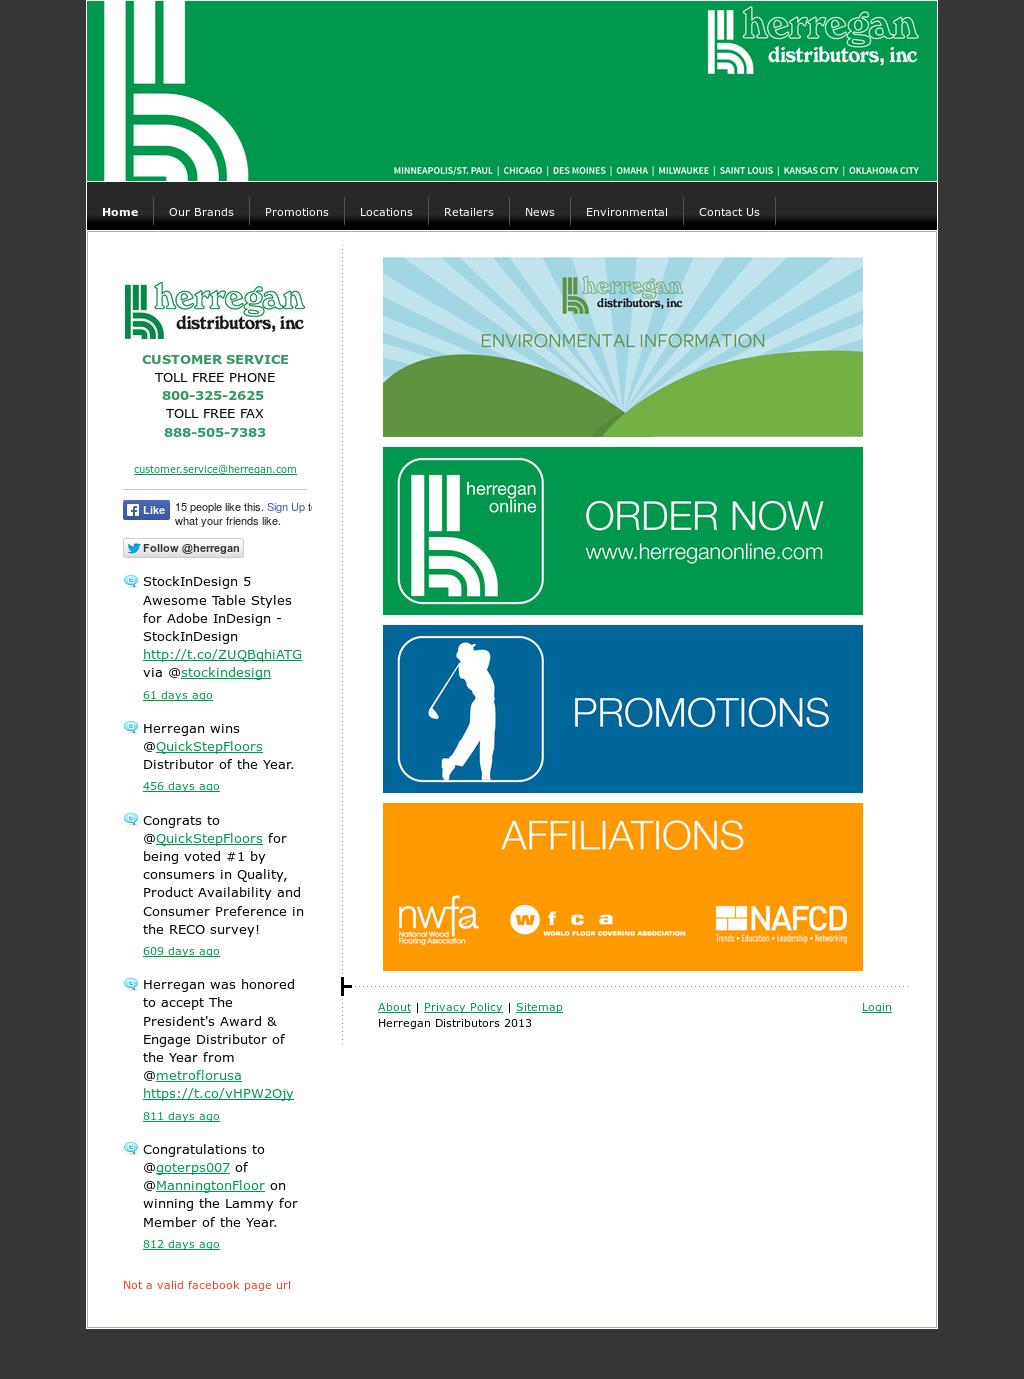 herregan distributors competitors revenue and employees owler